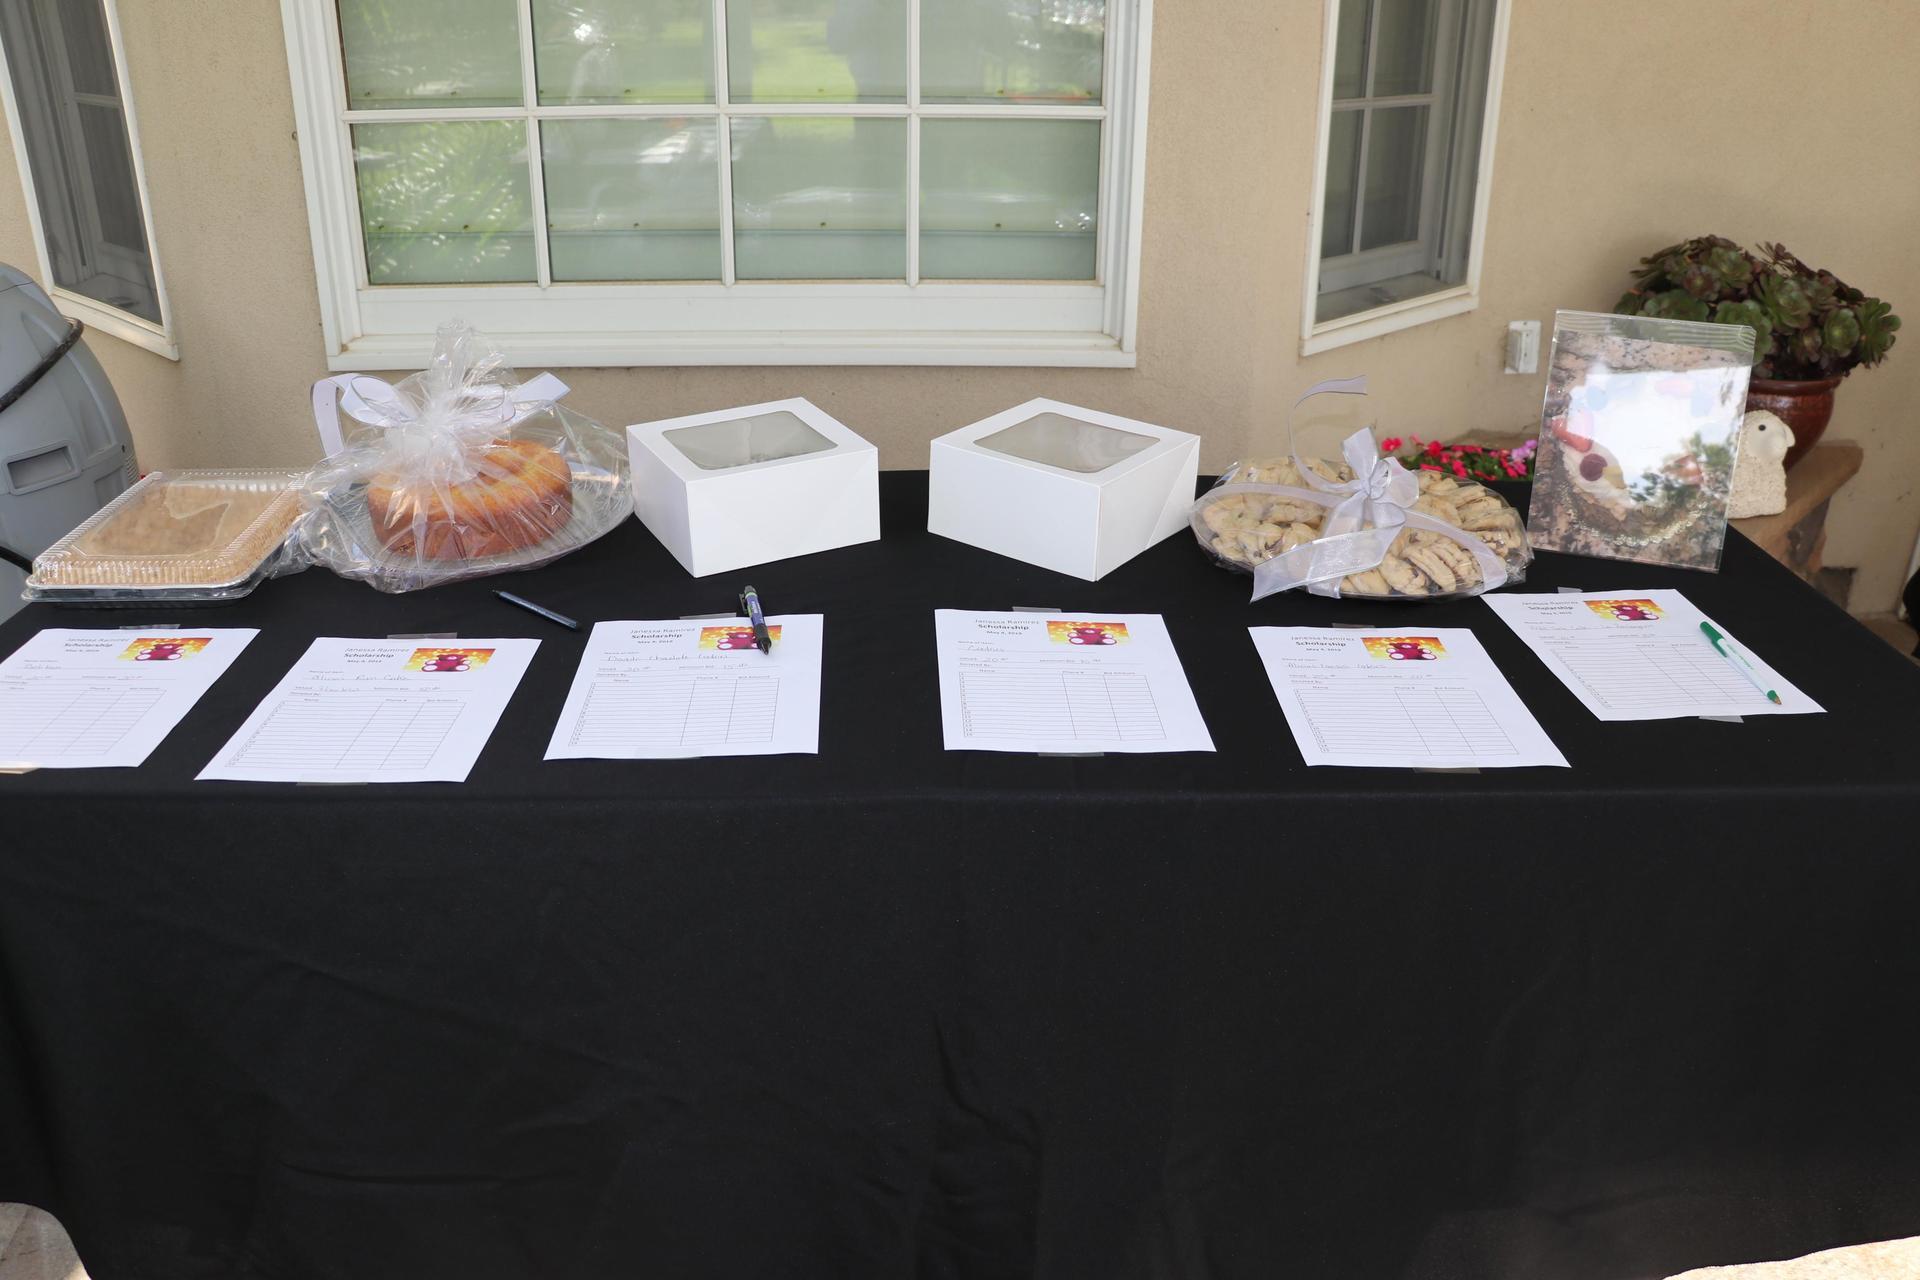 Auction Items at the 2019 Janessa Ramirez Scholarship Awards Dinner